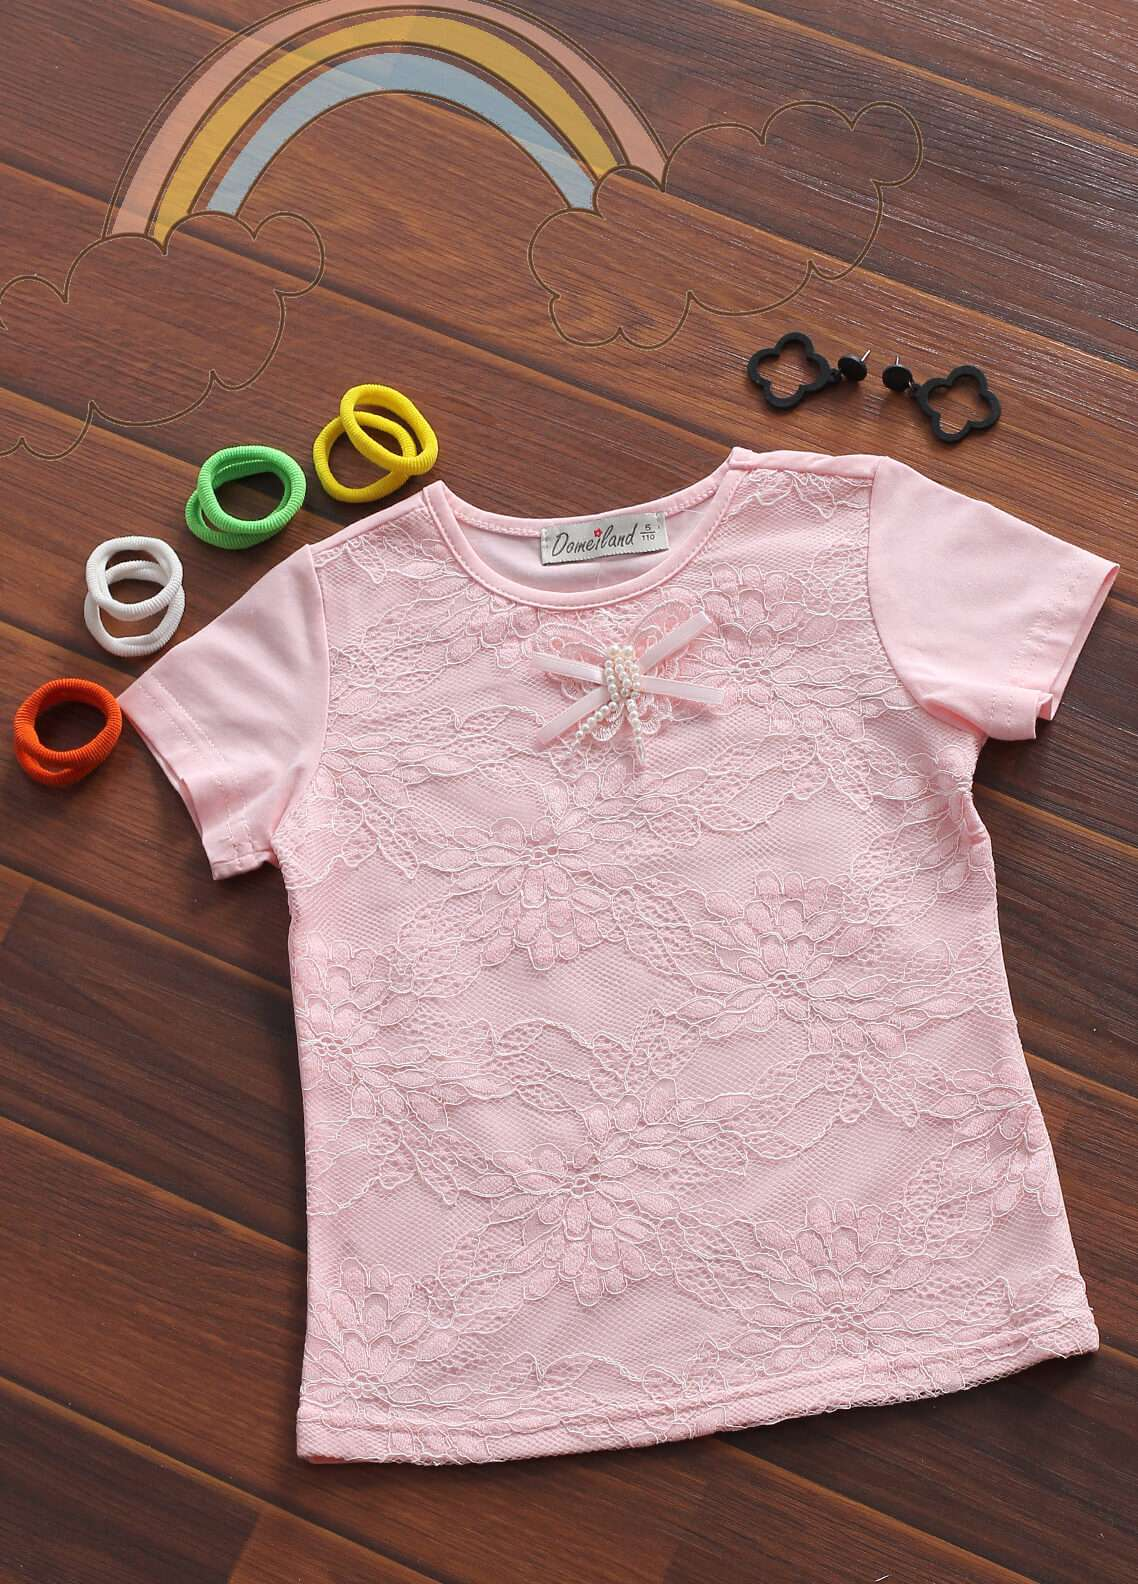 Sanaulla Exclusive Range Cotton Fancy Girls Tees -  802580 Pink